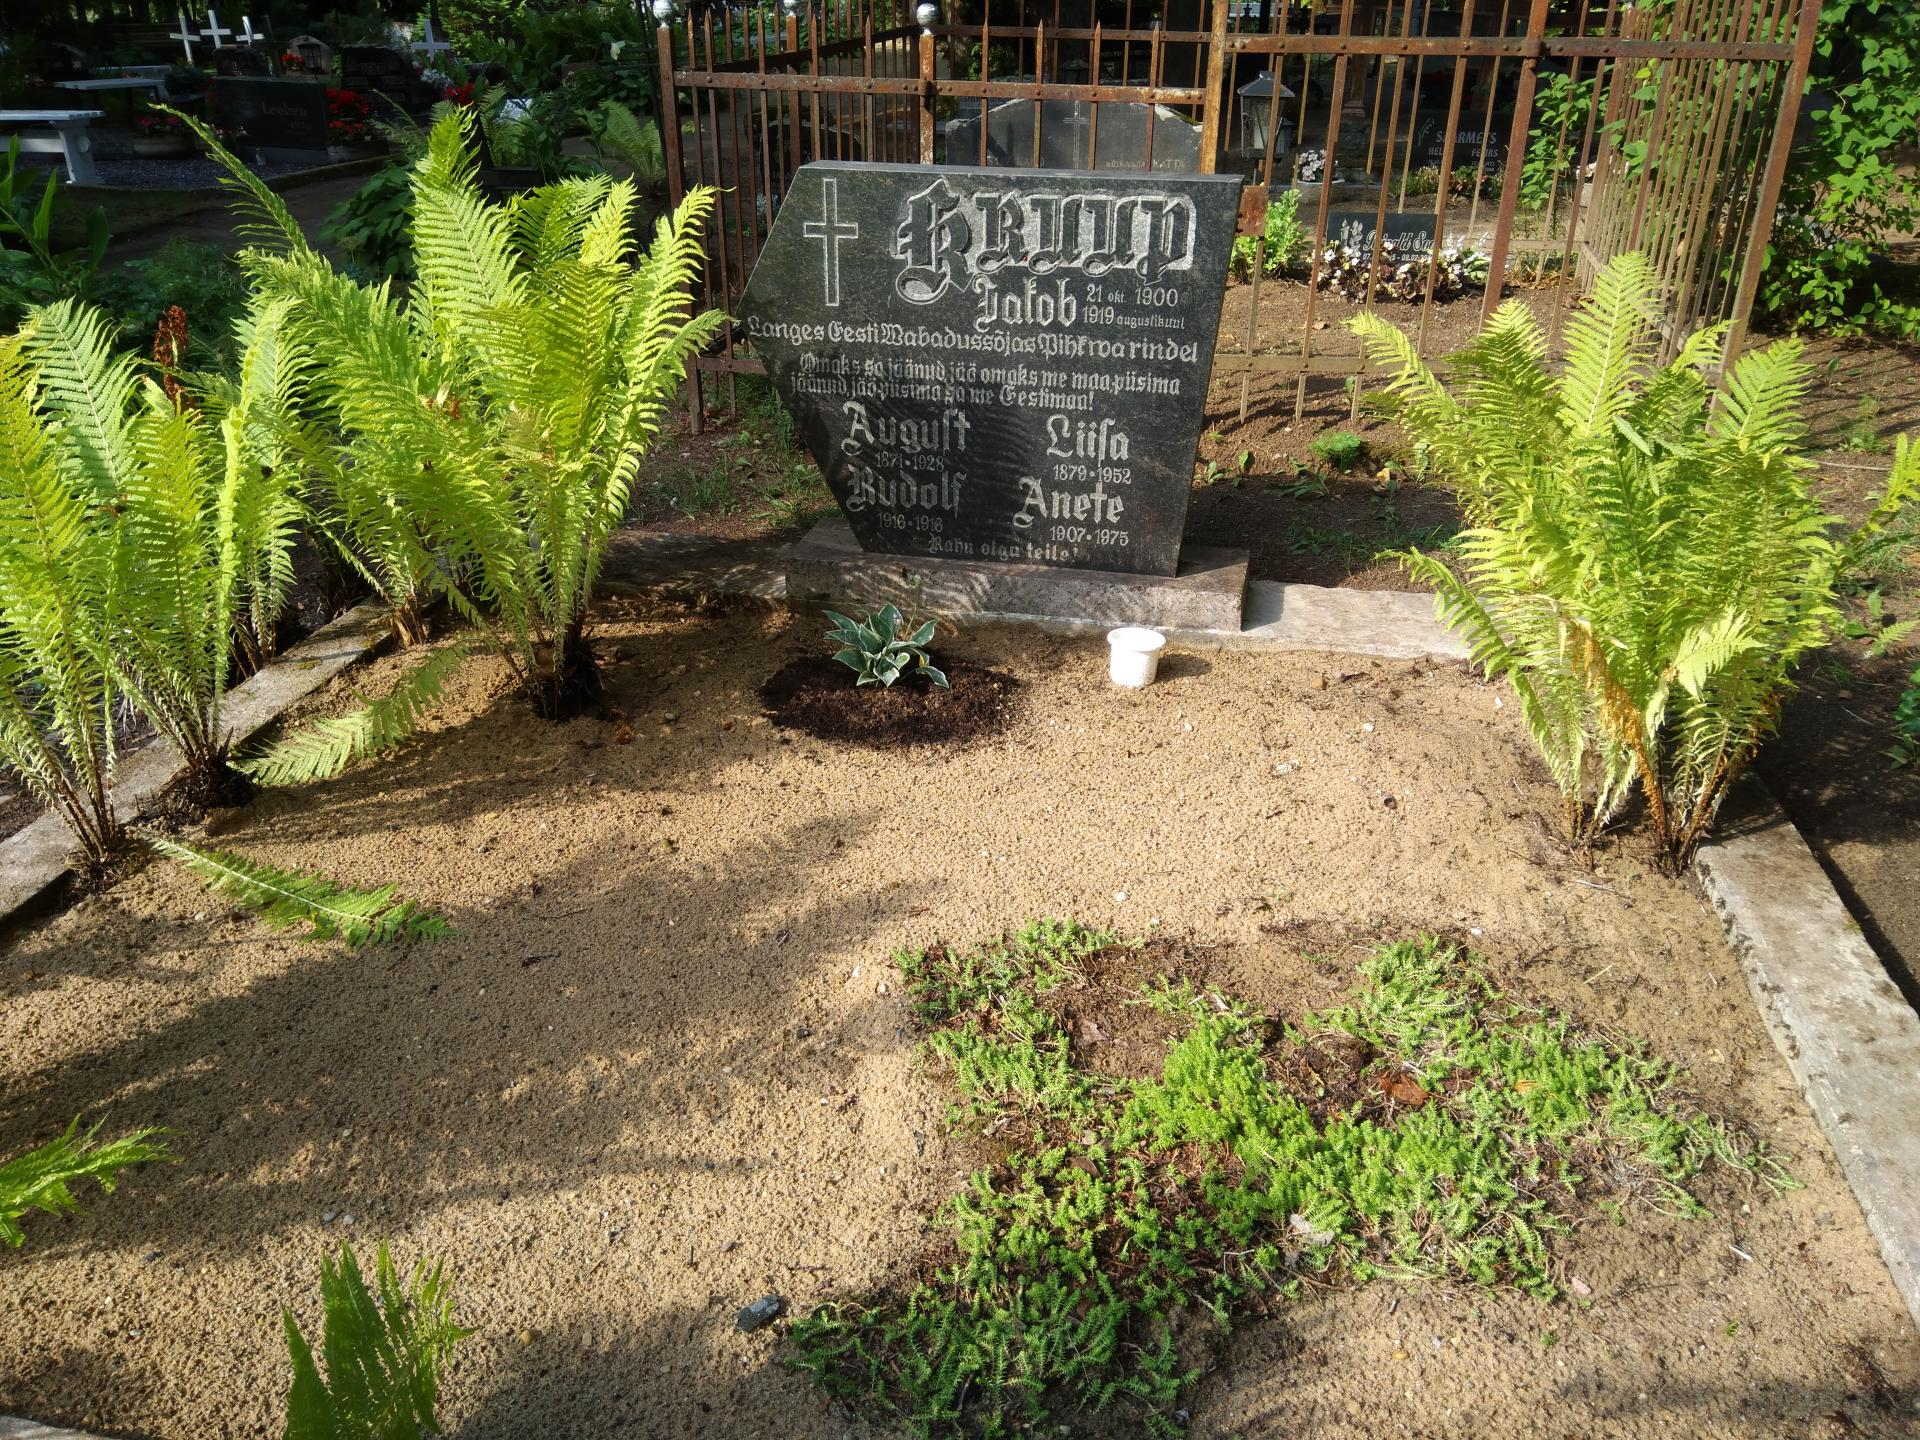 https://www.haudi.ee/uploads/burialplace_5bd1eee650a71.jpg